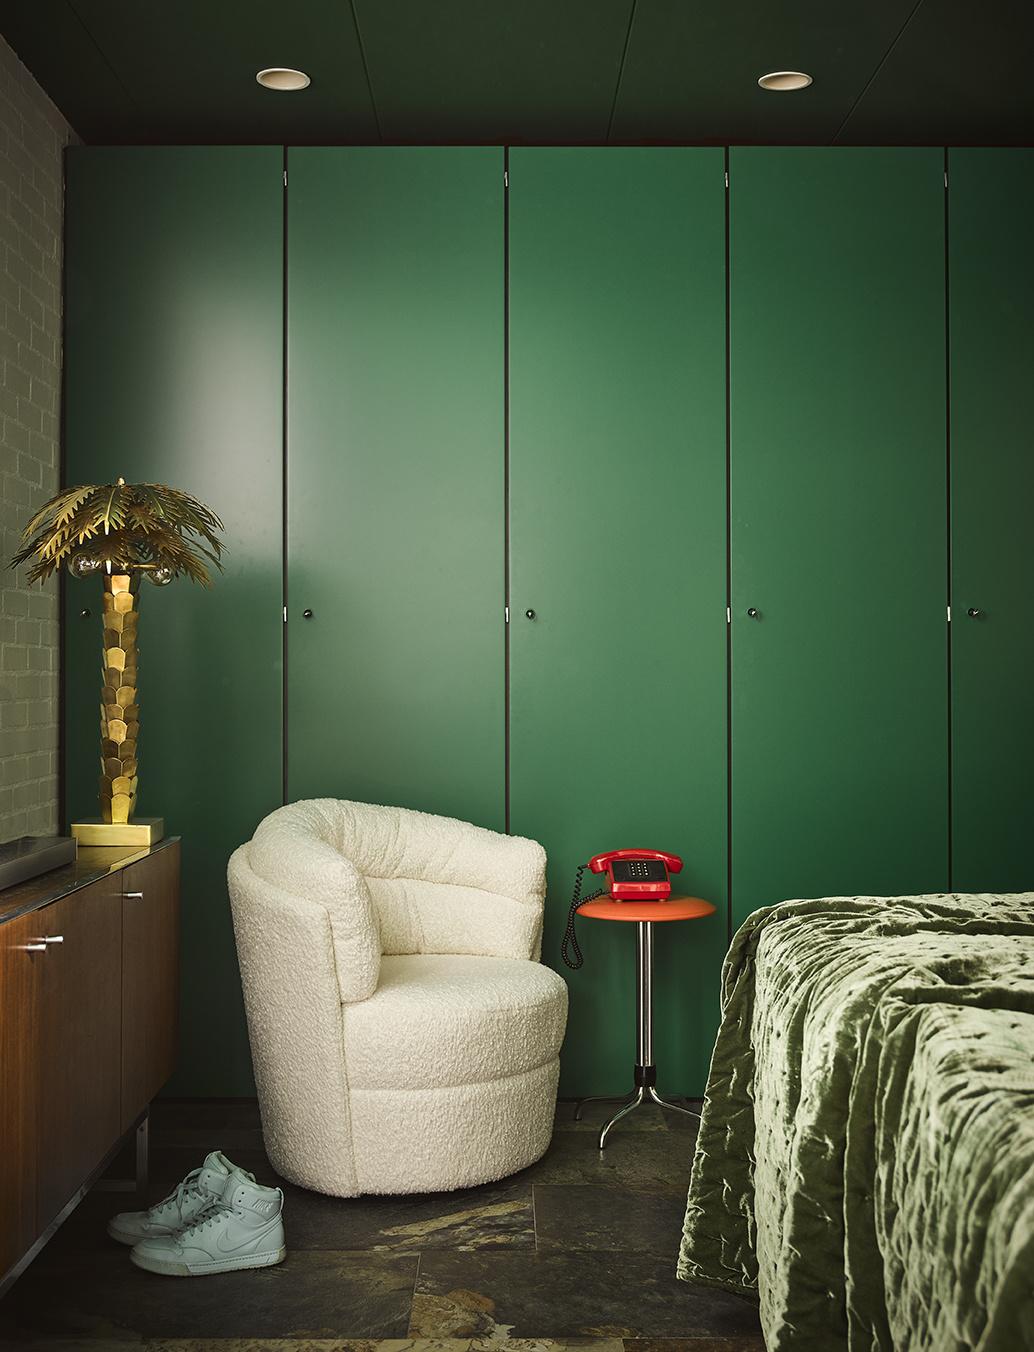 HK Living Retro lounge fauteuil twister cream - 76x76x86cm - HK Living